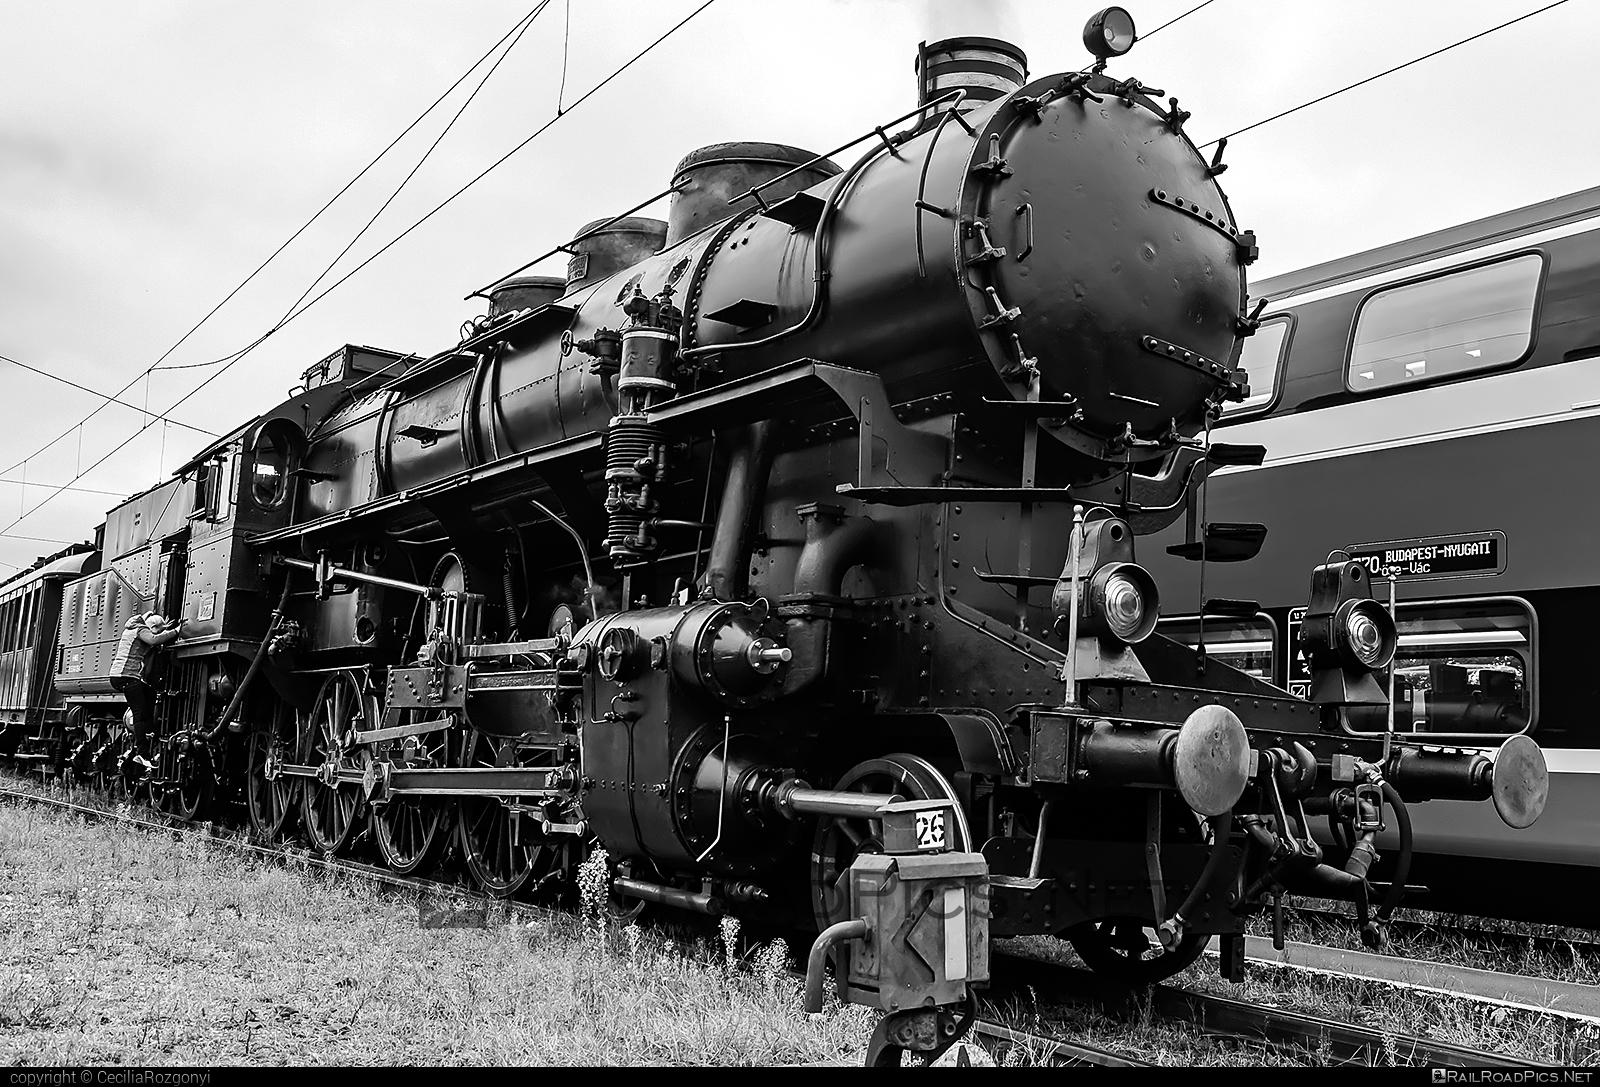 MÁVAG Class 424 - 424.009 operated by MÁV Nosztalgia Kft. #mavag #mavag424 #mavagclass424 #mavclass424